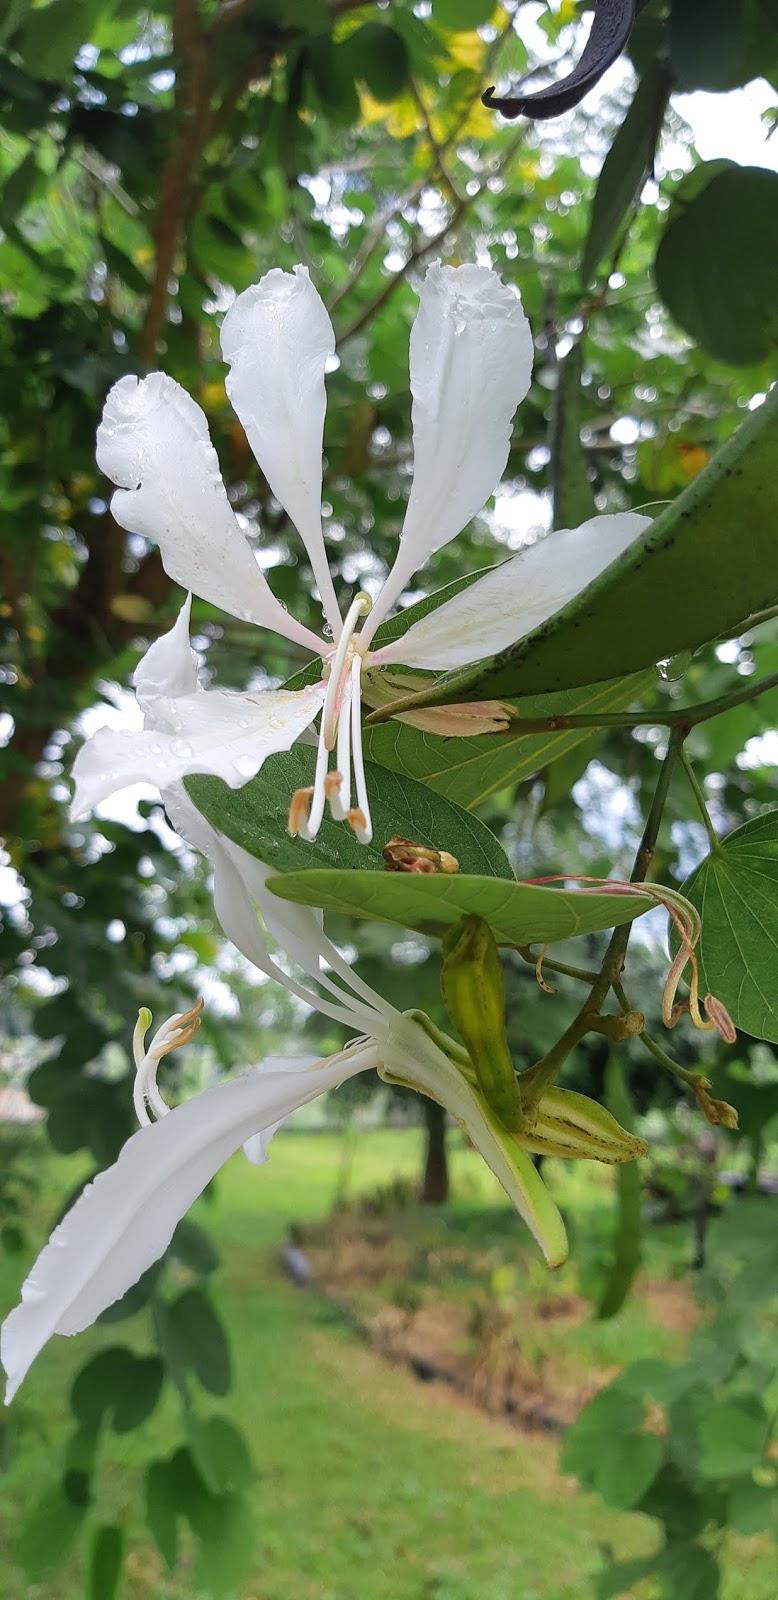 Pohon Daun Kupu Kupu Anggrek Hongkong Bauhinia Blakean Planter And Forester